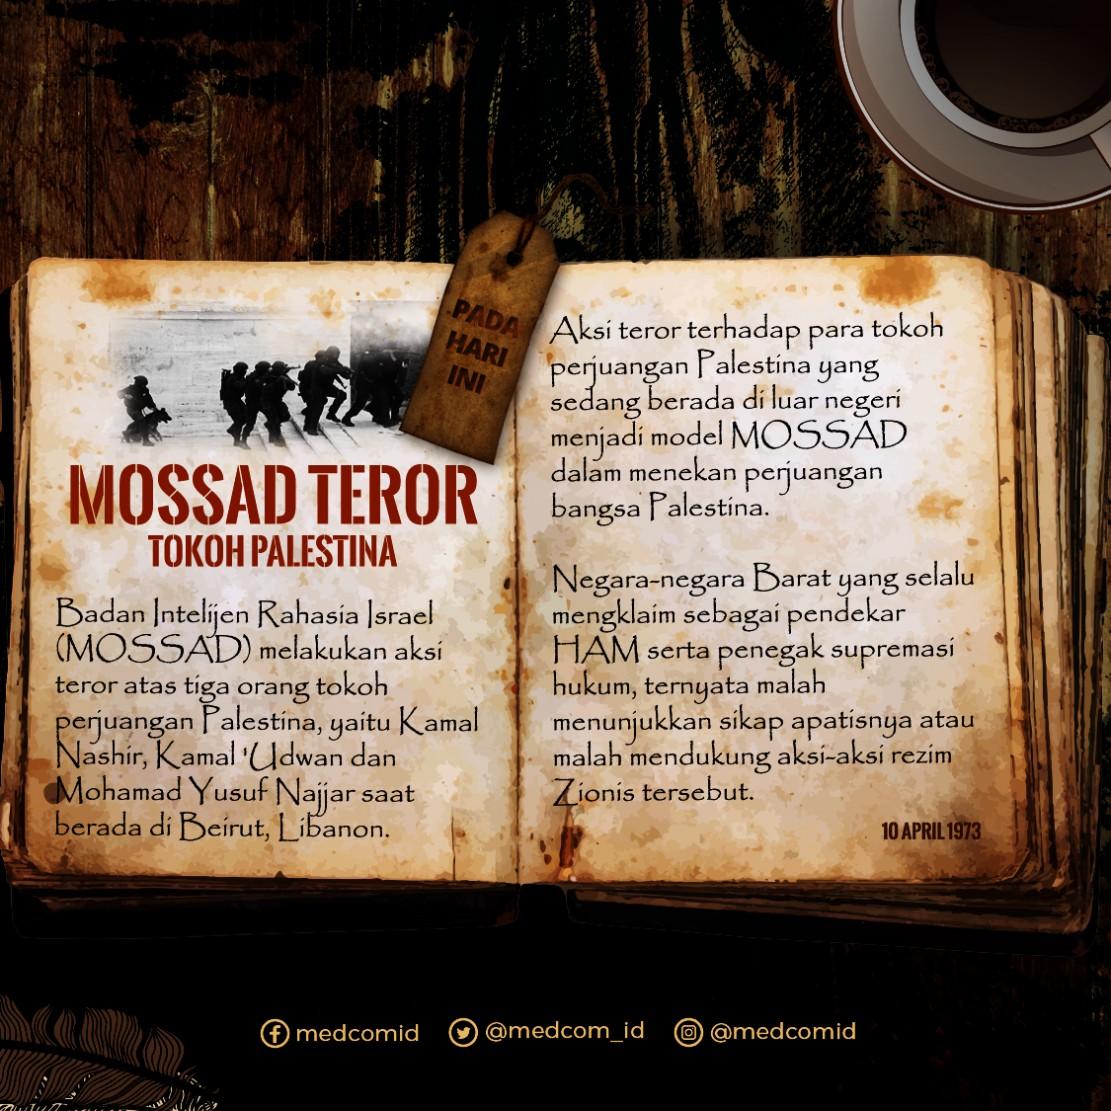 Hari ini: Mossad Teror Tokoh Palestina